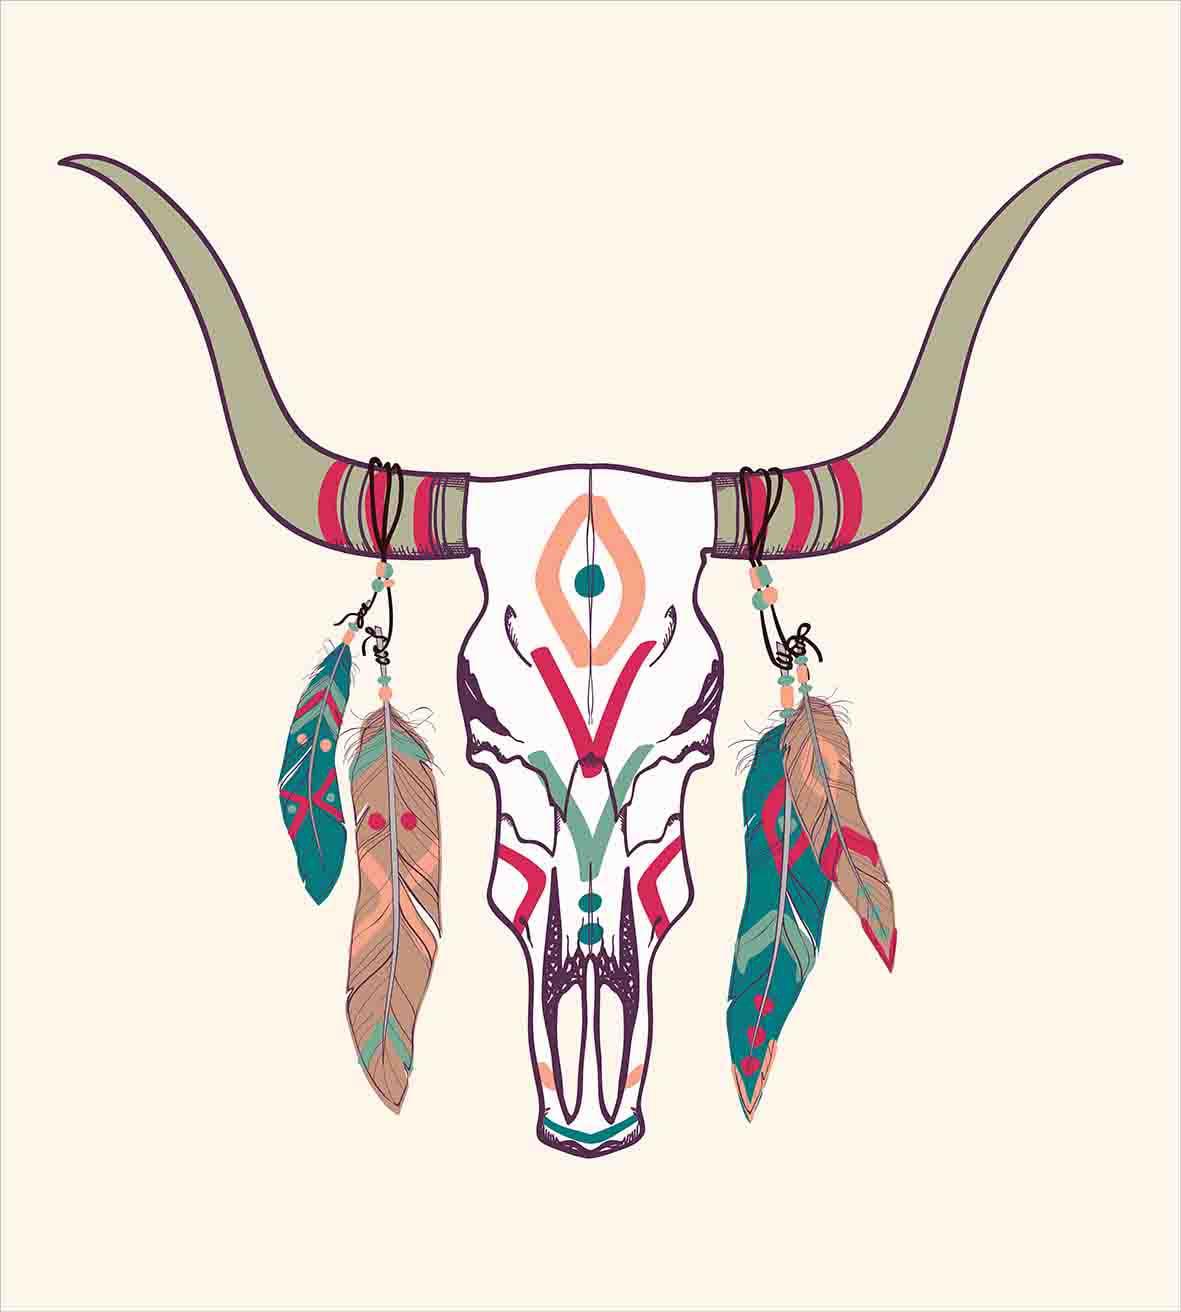 Deer Skull Tattoo Longhorn Flower Drawings Wwwgalleryneedcom